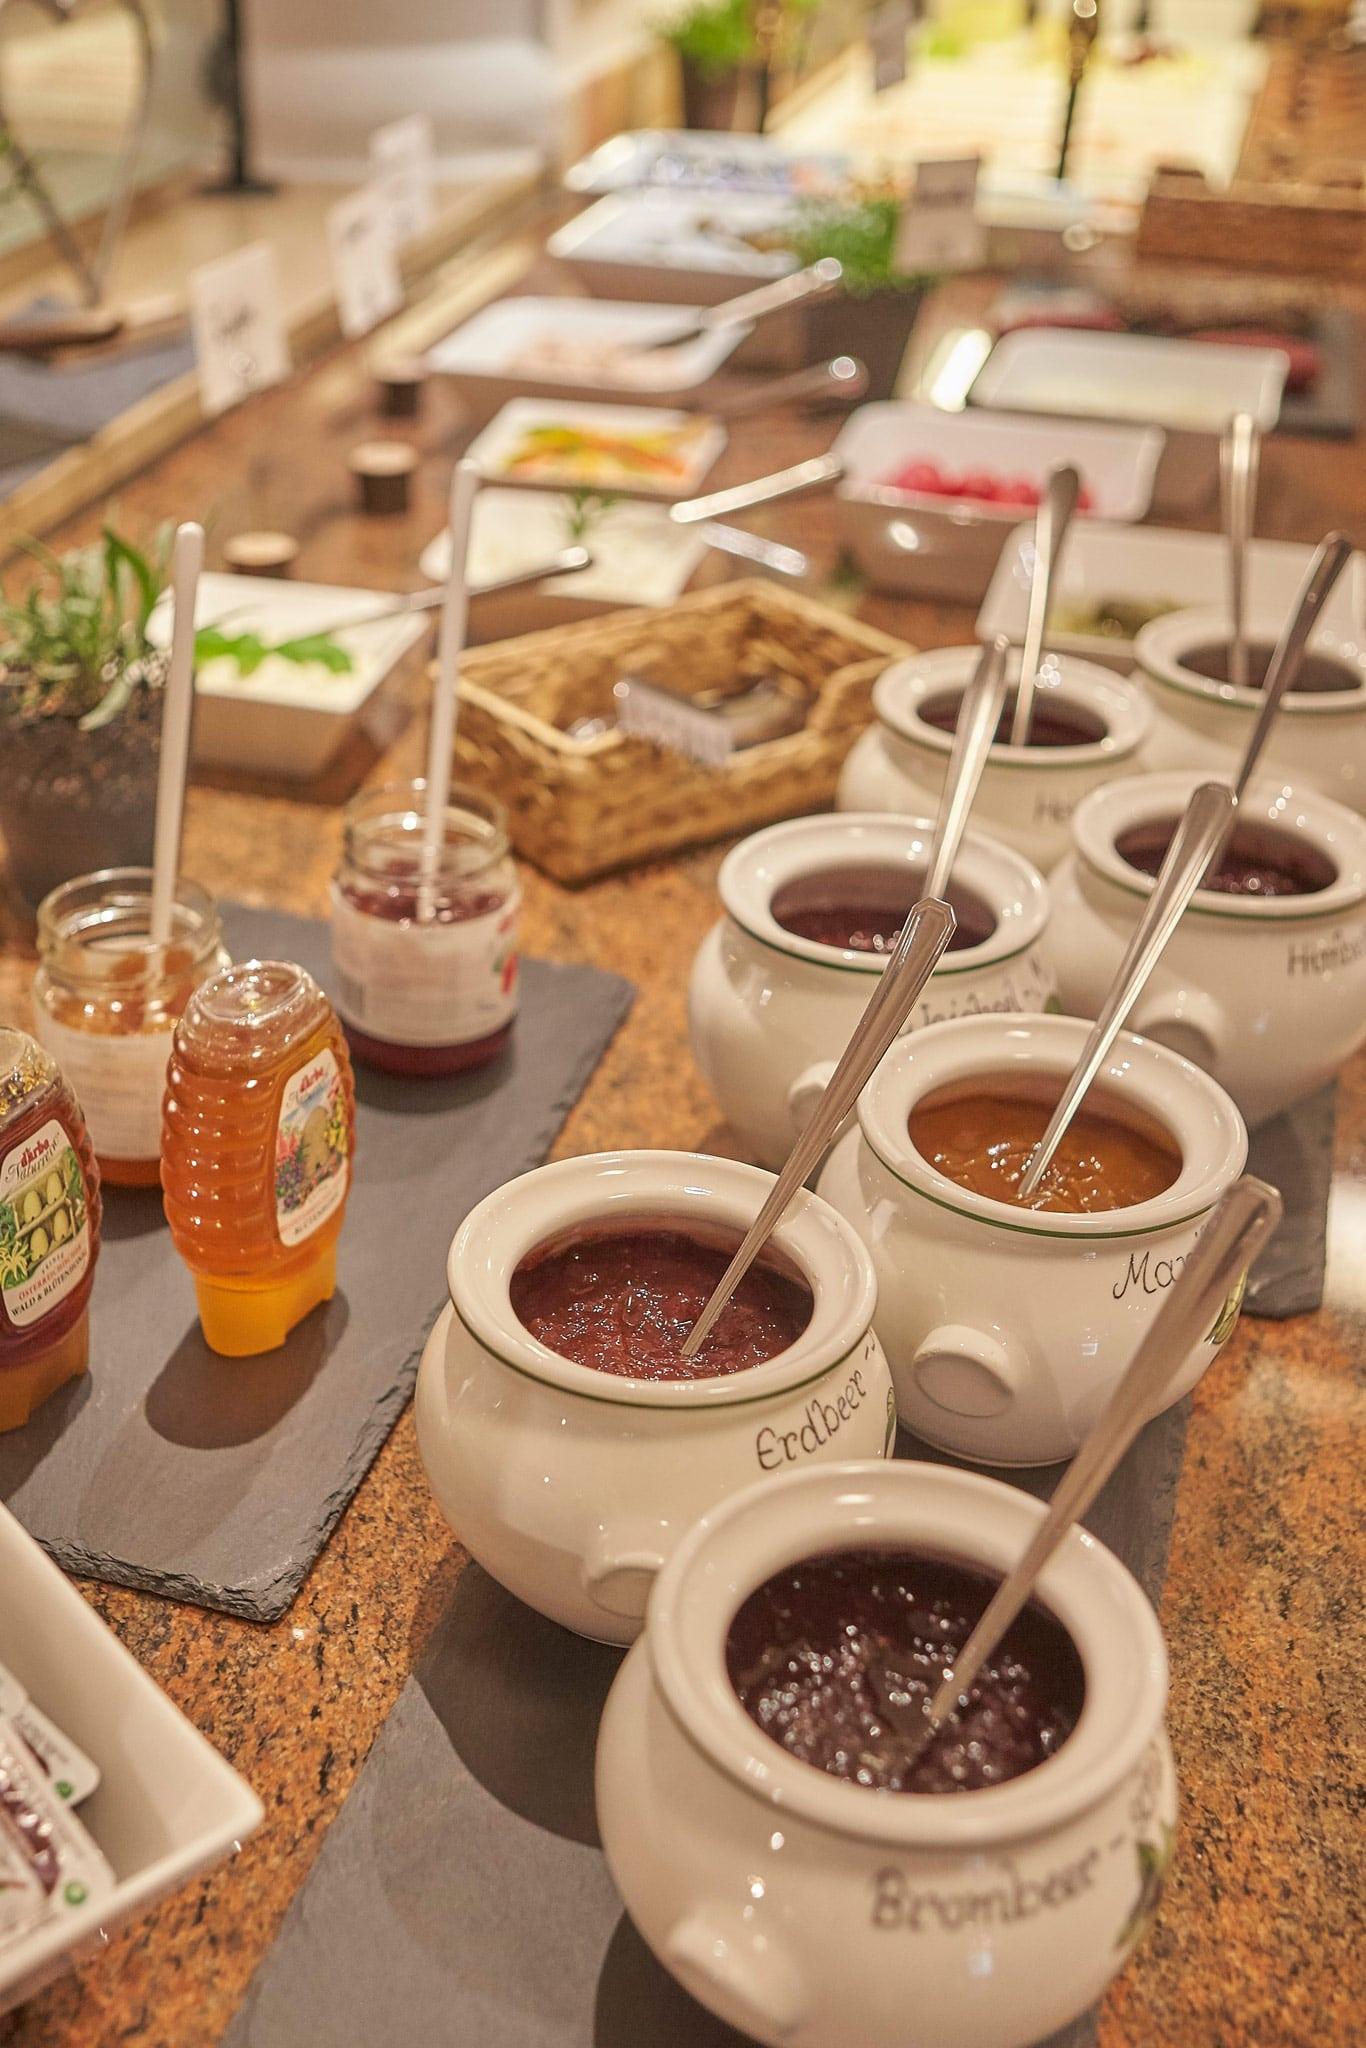 Honig und Marmelade am Buffet